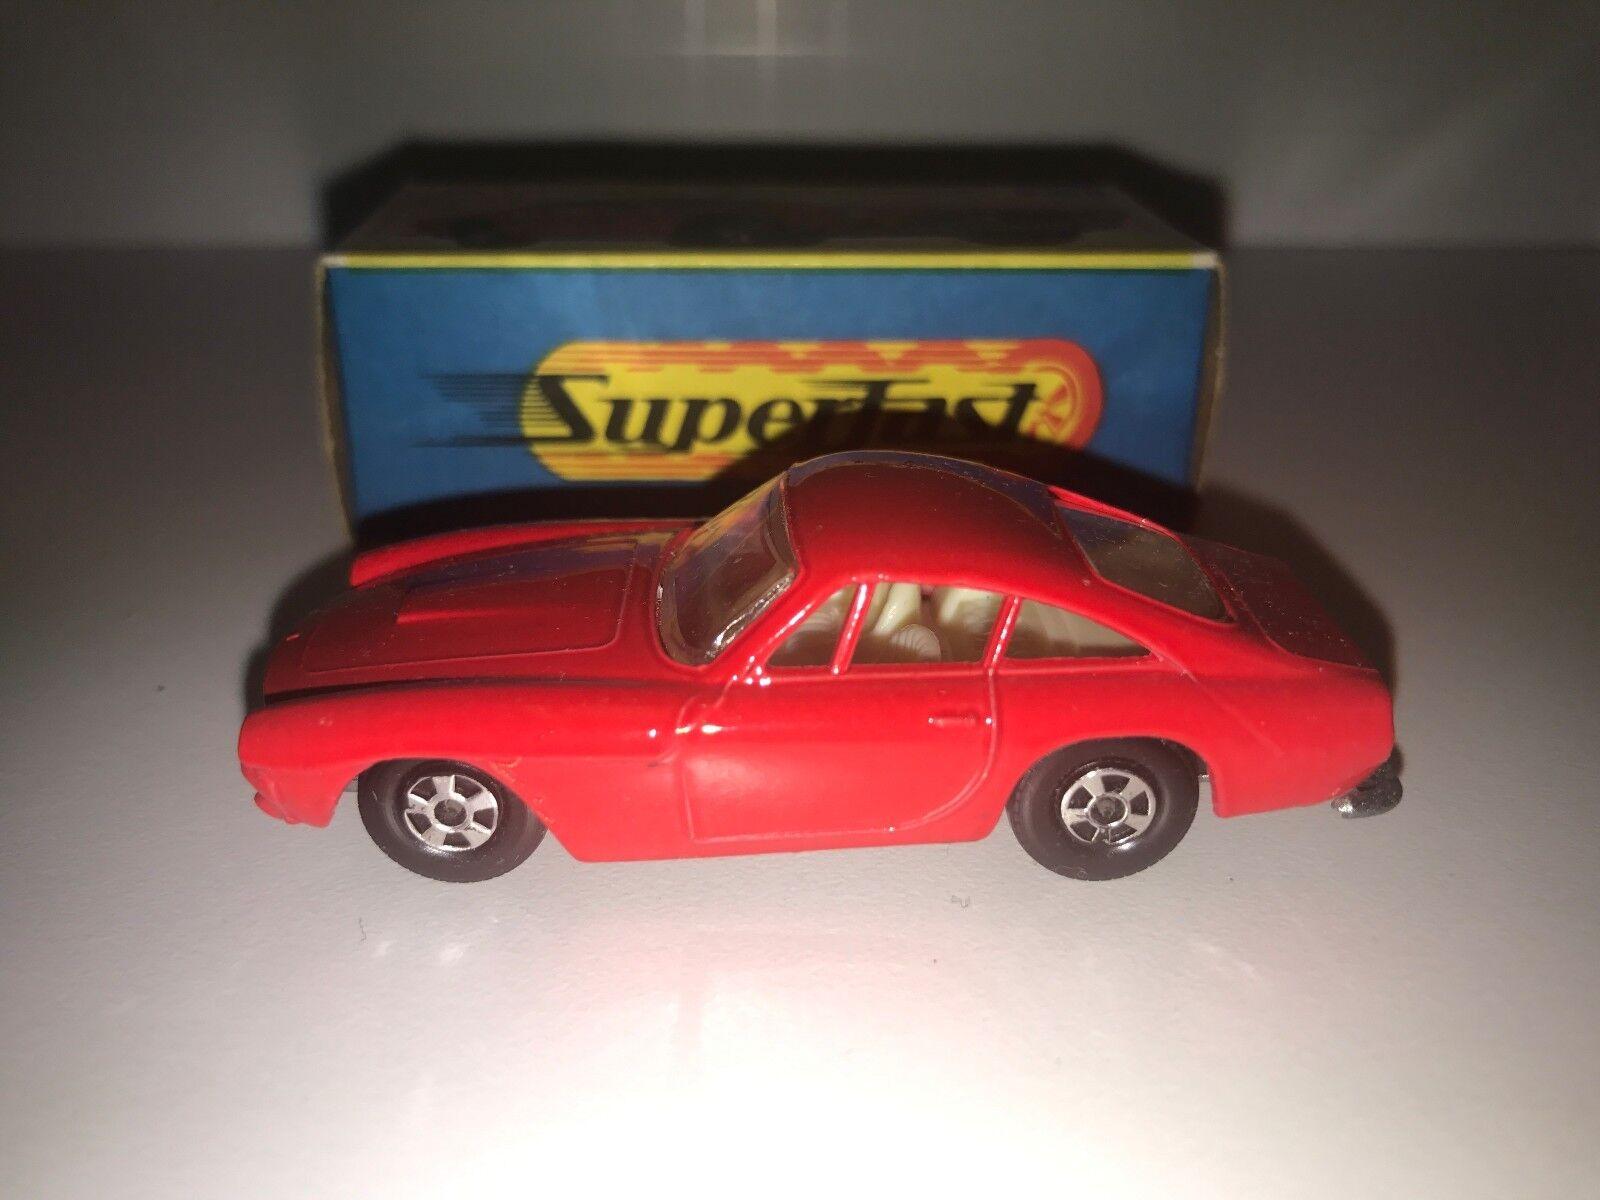 Matchbox Rojo Ferrari Berlinetta súperfast Menta Menta en caja original de G2